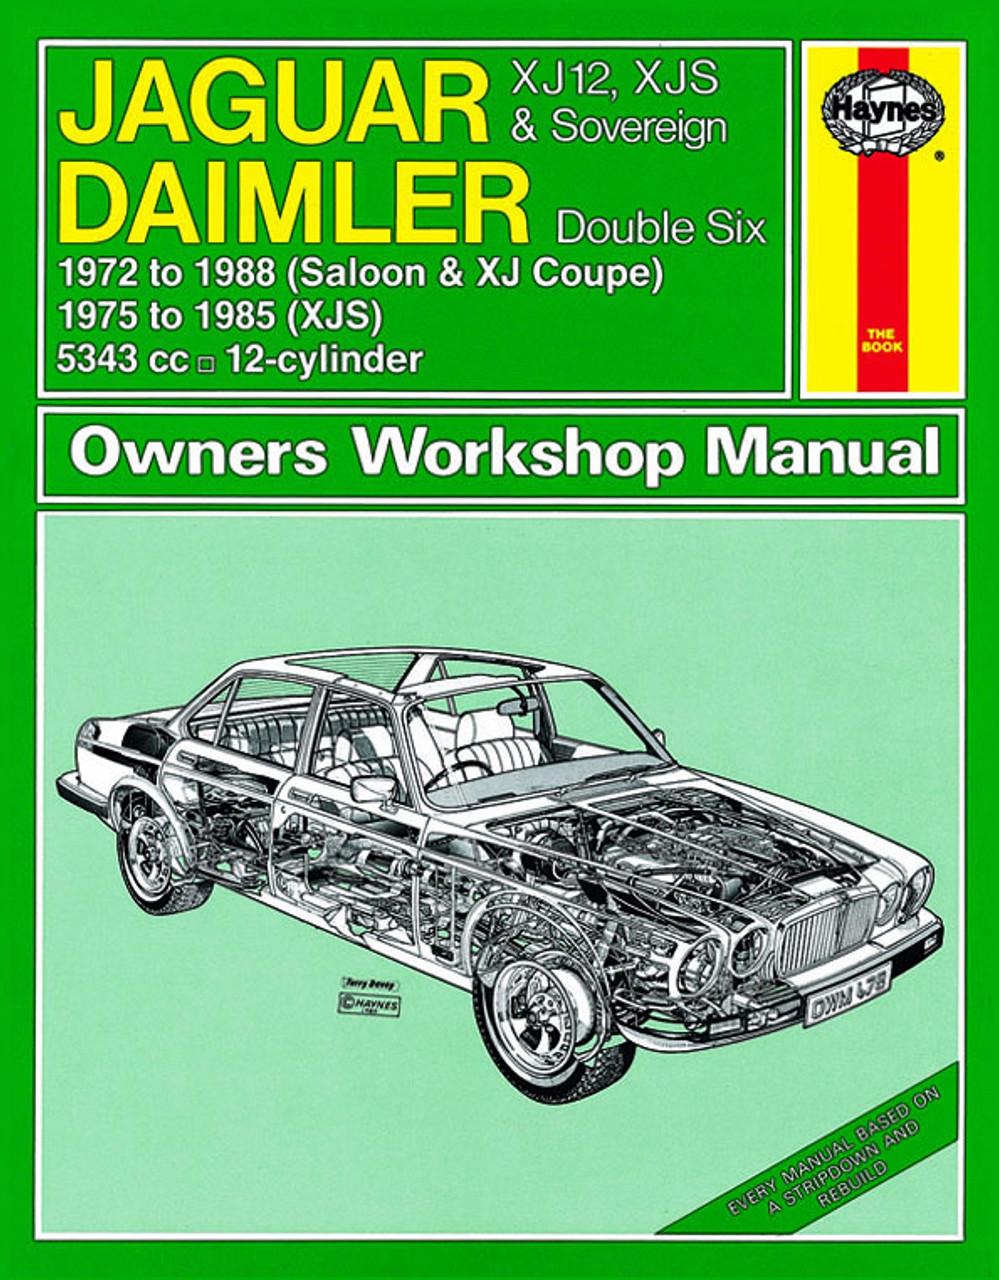 Haynes Workshop Manual Jaguar Daimler 1968-1986 XJ6 XJ Sovereign Service Repair